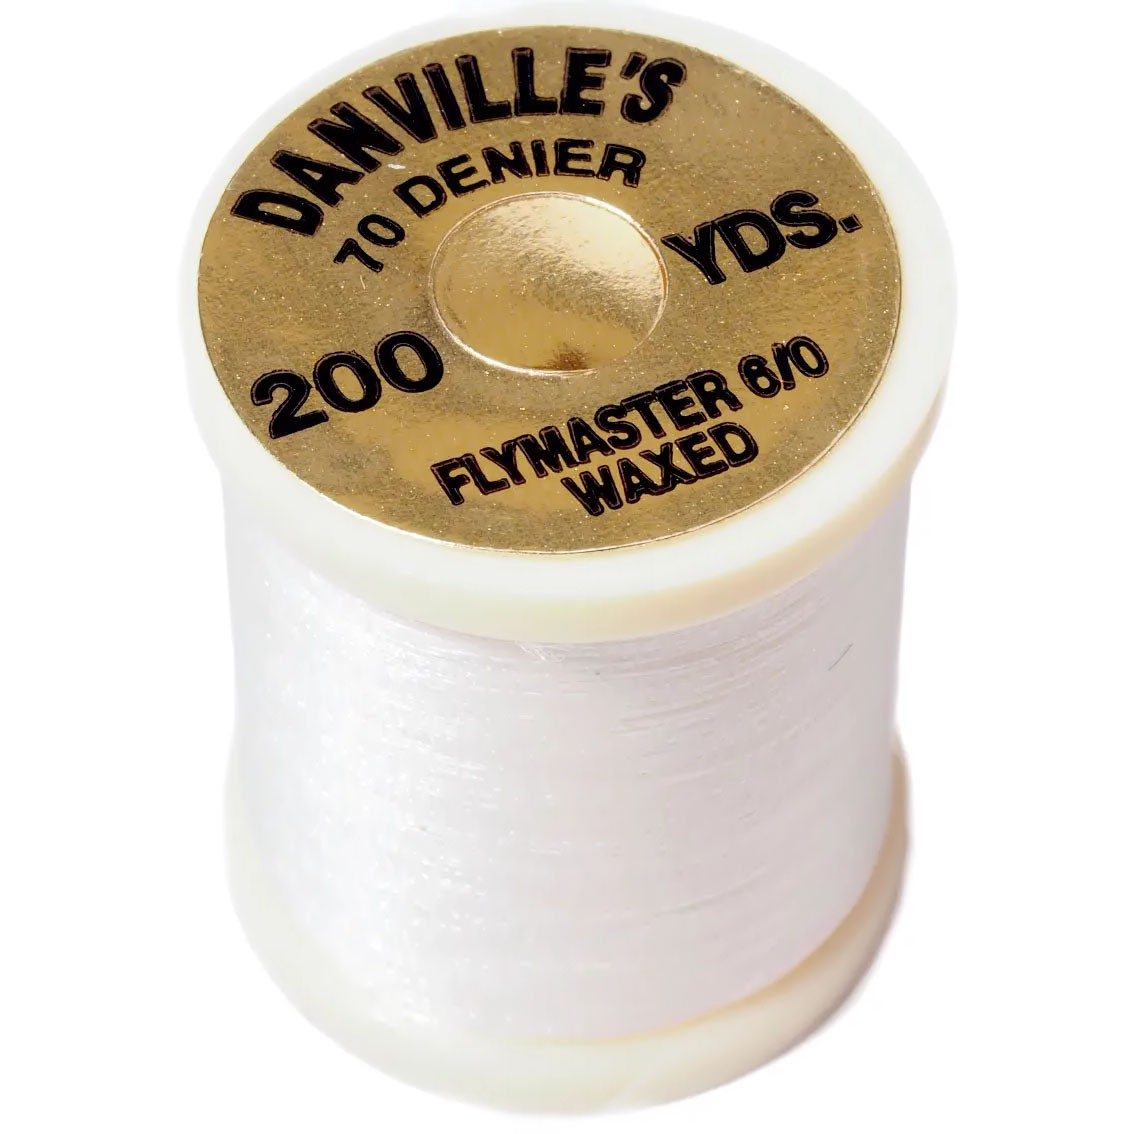 Fio Danville's Flymaster 6/0 (70 Denier)